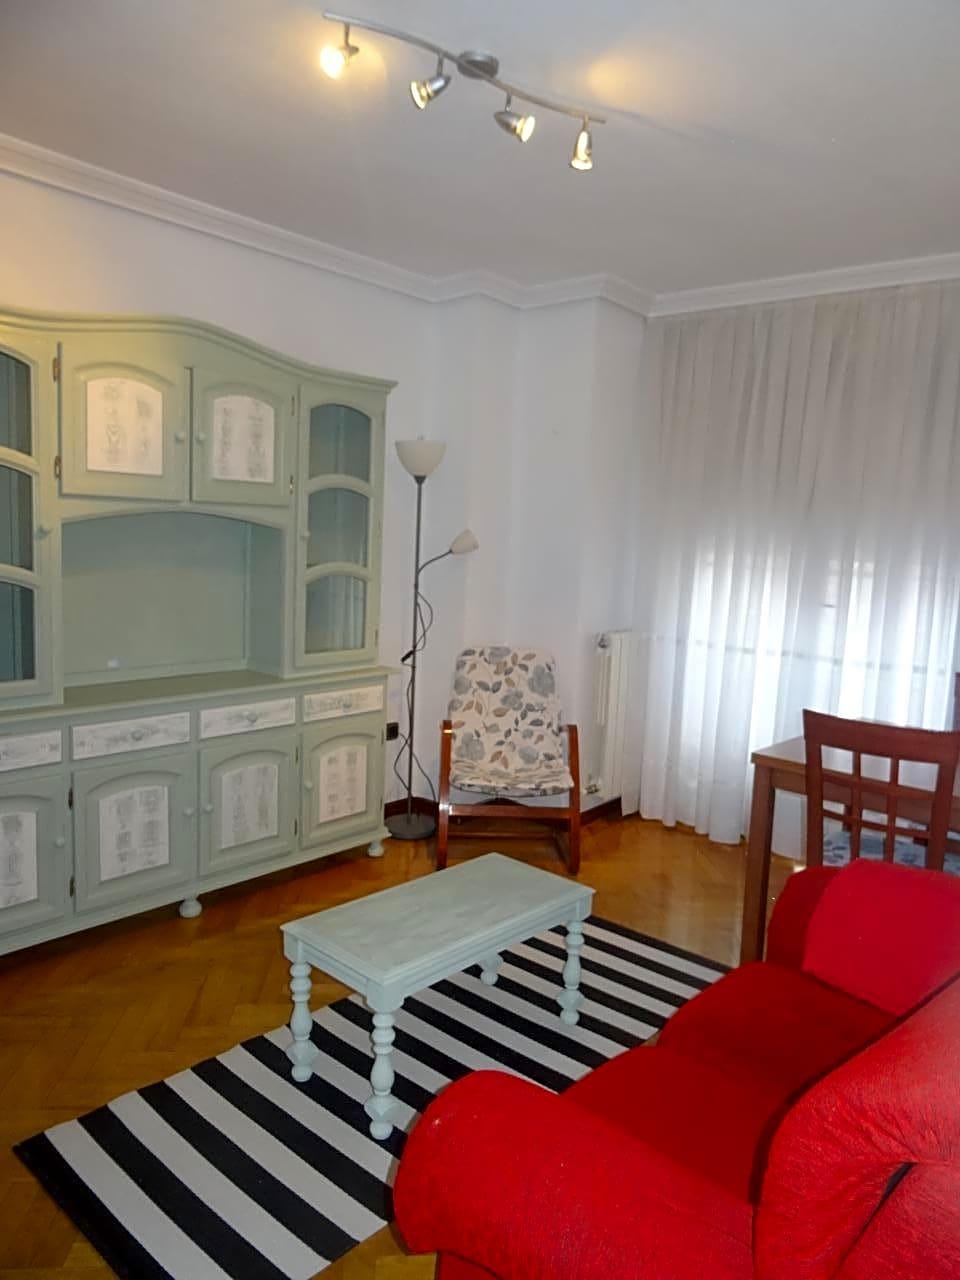 pisos en salamanca · calle-de-granero-37007 525€